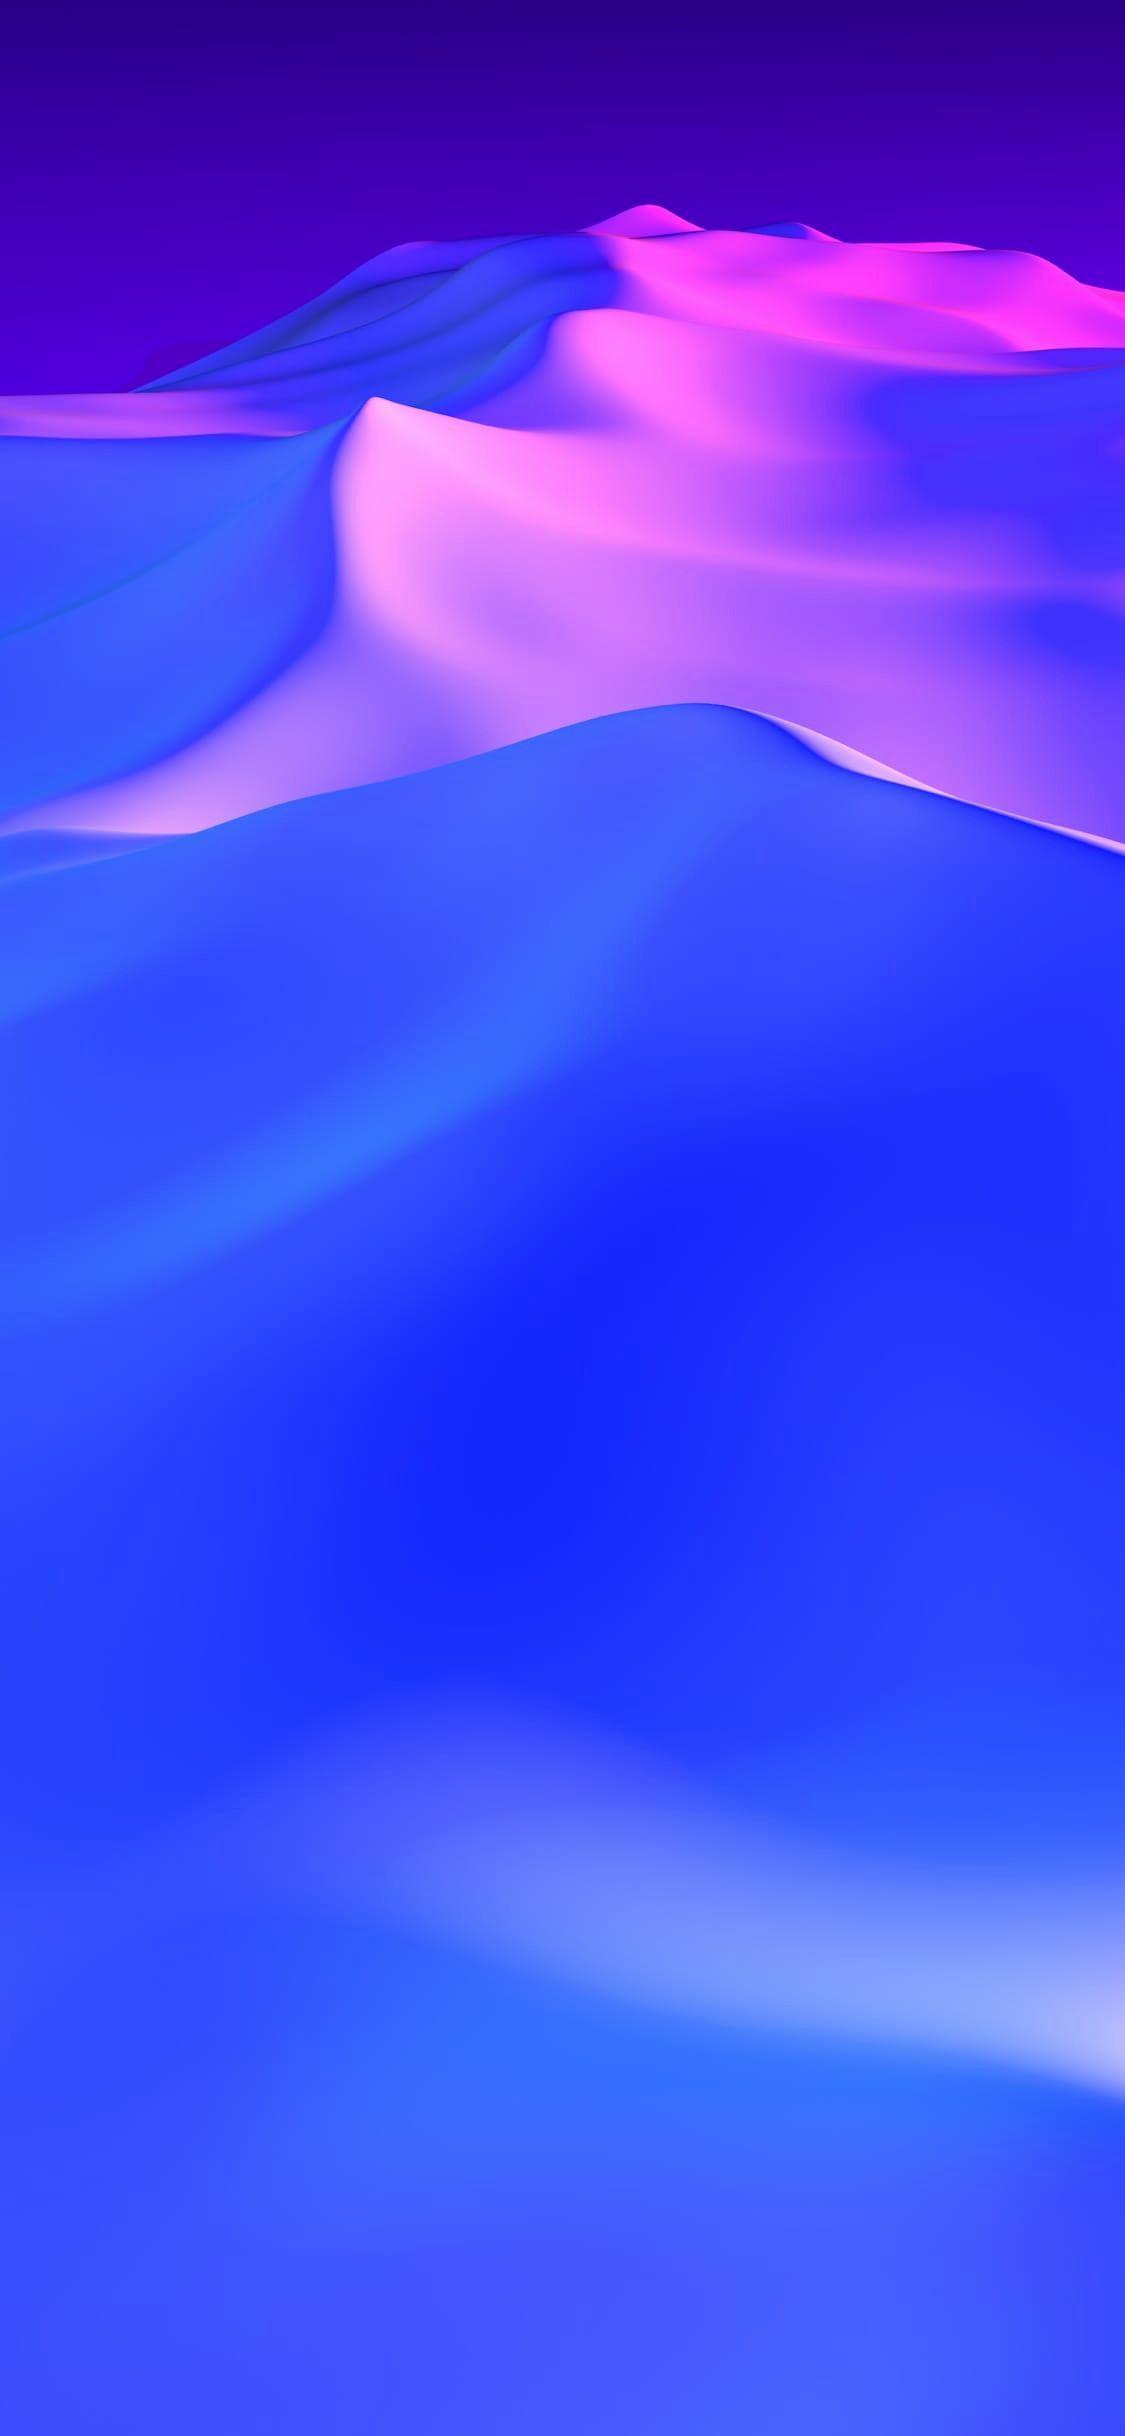 Smartphone 4k Blue Wallpapers Wallpaper Cave